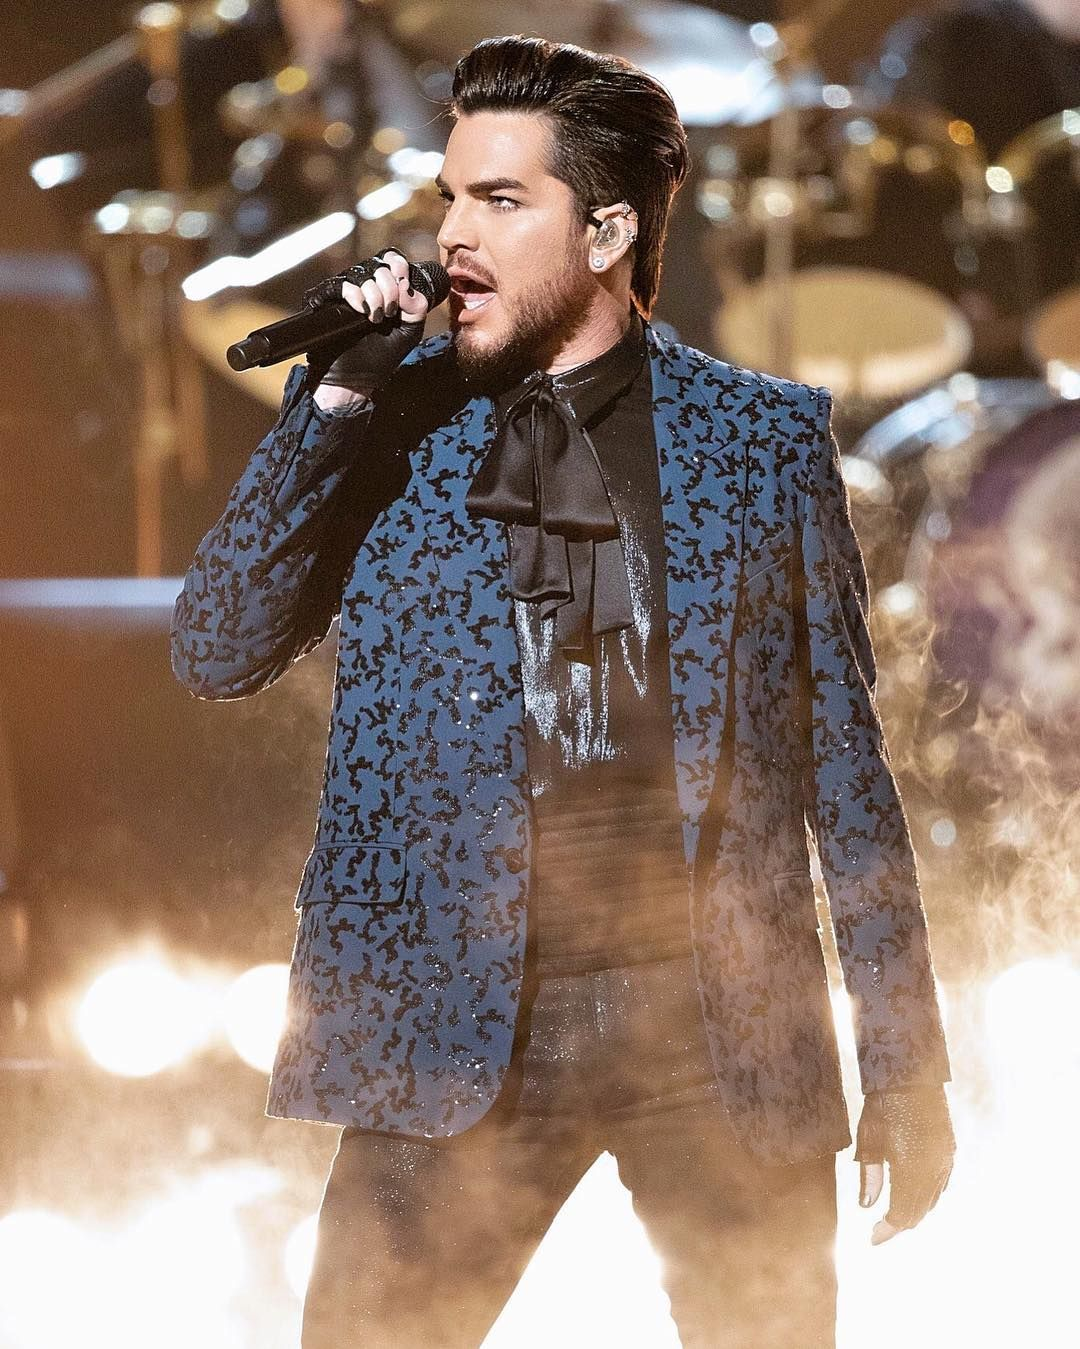 Adam Lambert Cynthia On Instagram Adamlambert More Stunning Pictures Fr Queen With Adam Lambert Adam Lambert American Idol Contestants